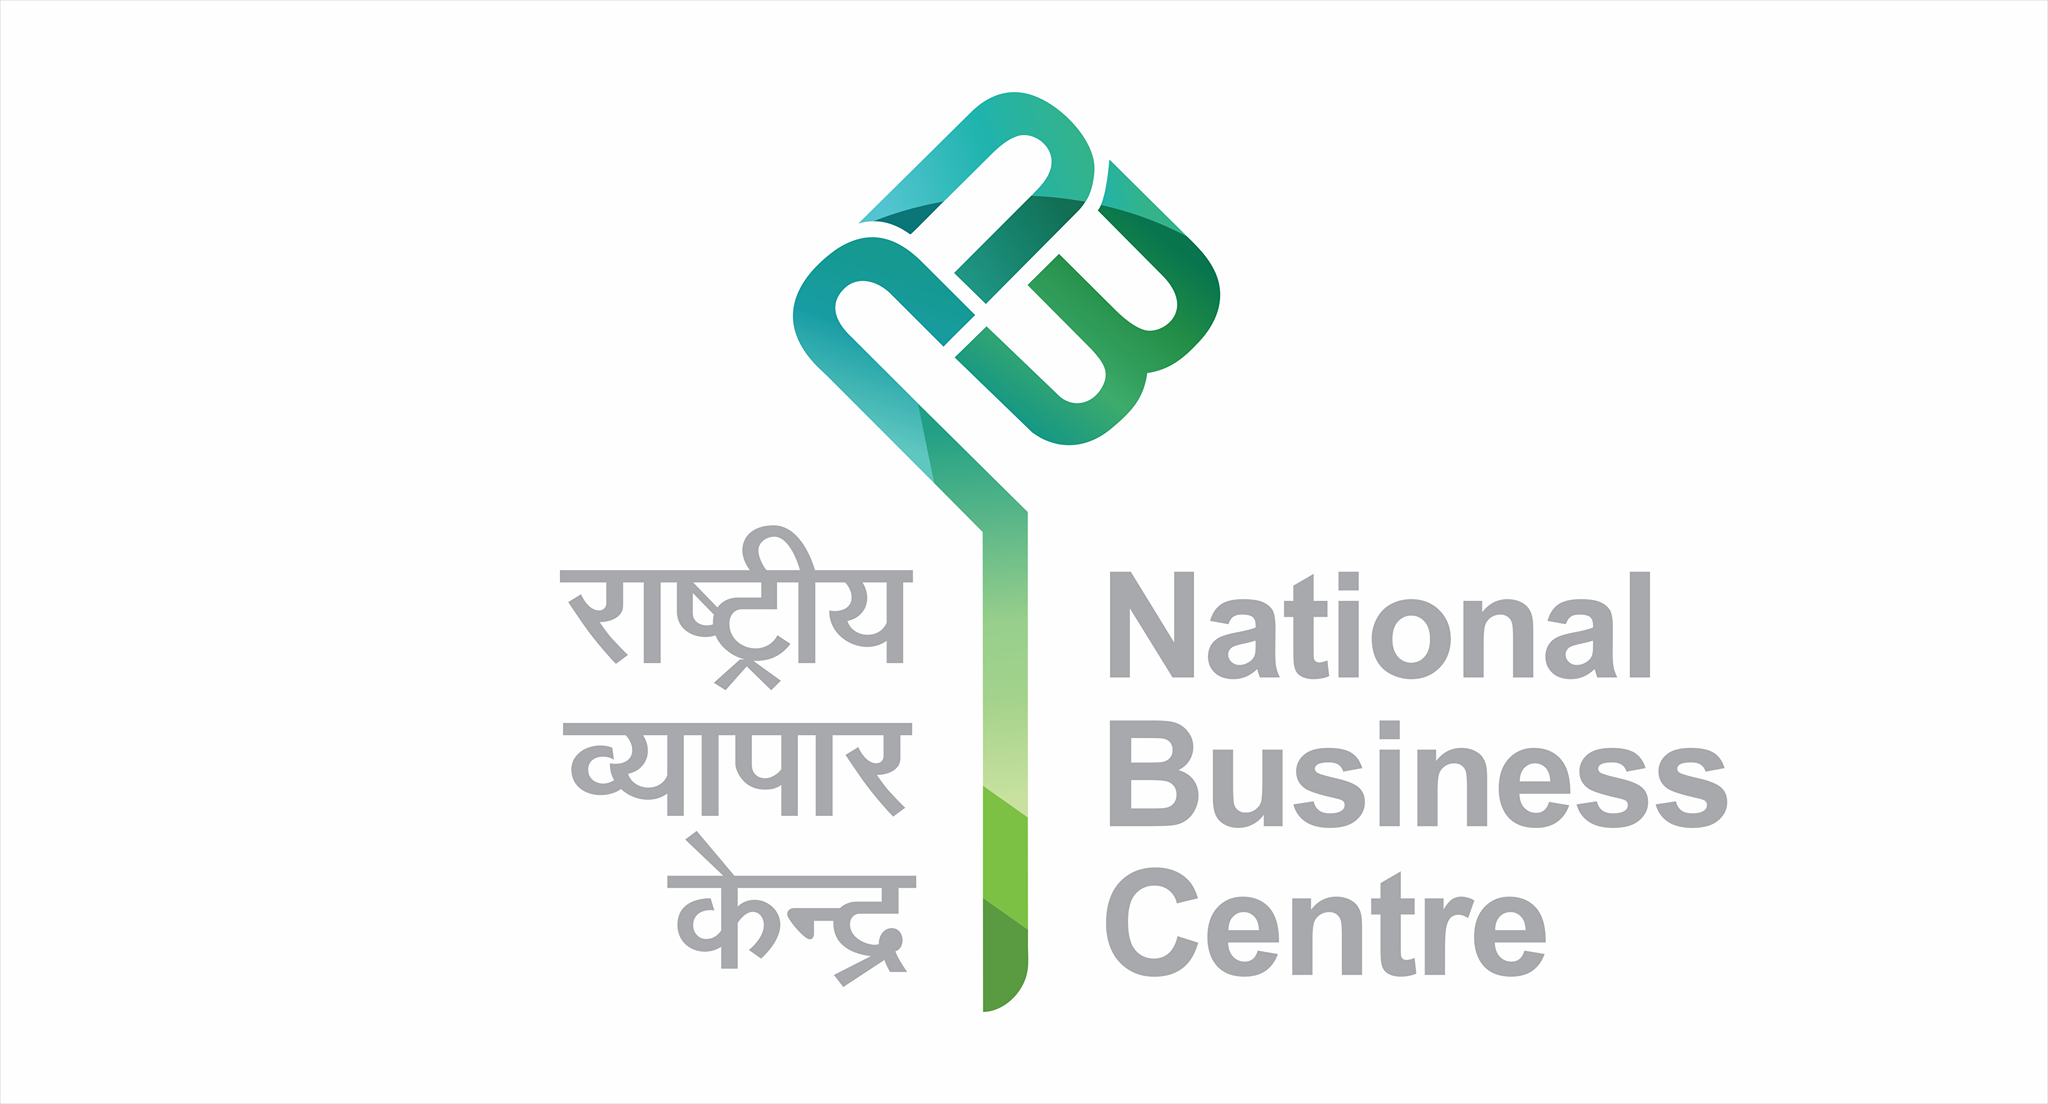 Powerhouse DelhiNCR is an economic powerhouse in India